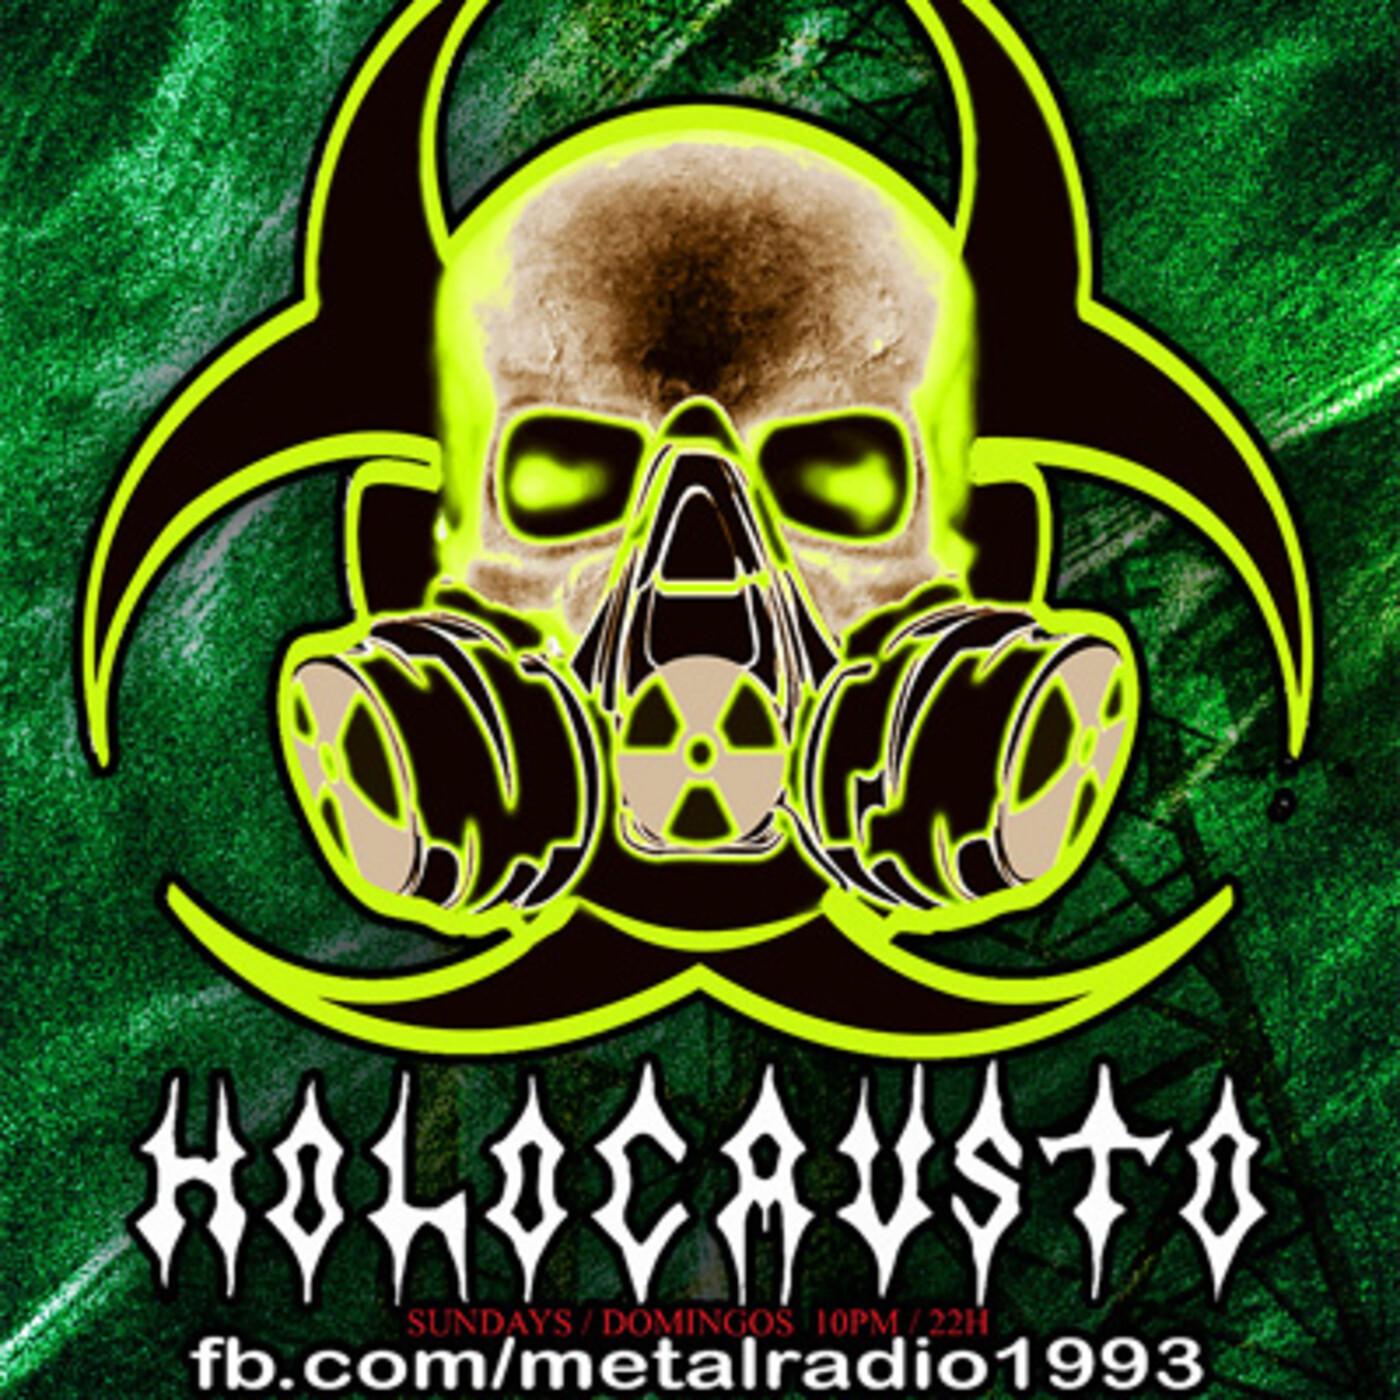 Radio Holocausto - Metal Radio